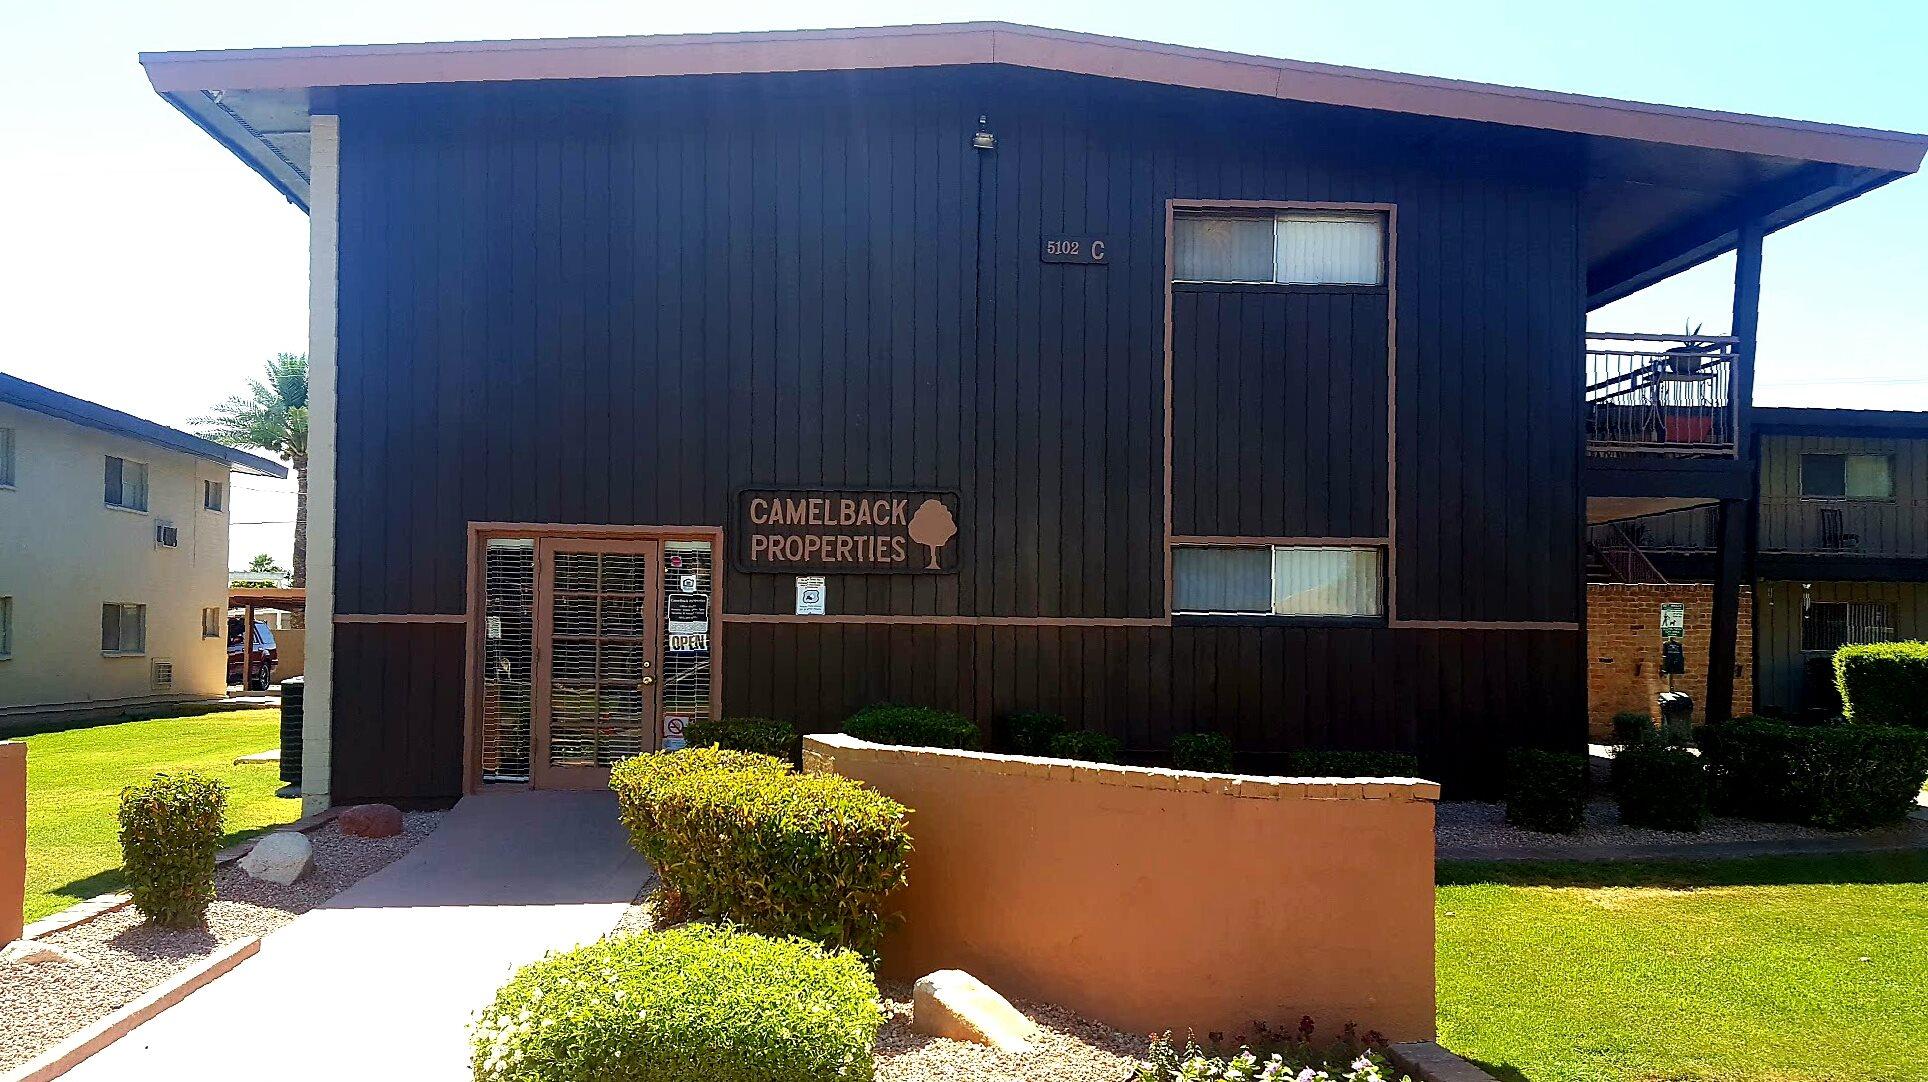 Image of Camelback Properties in Phoenix, Arizona